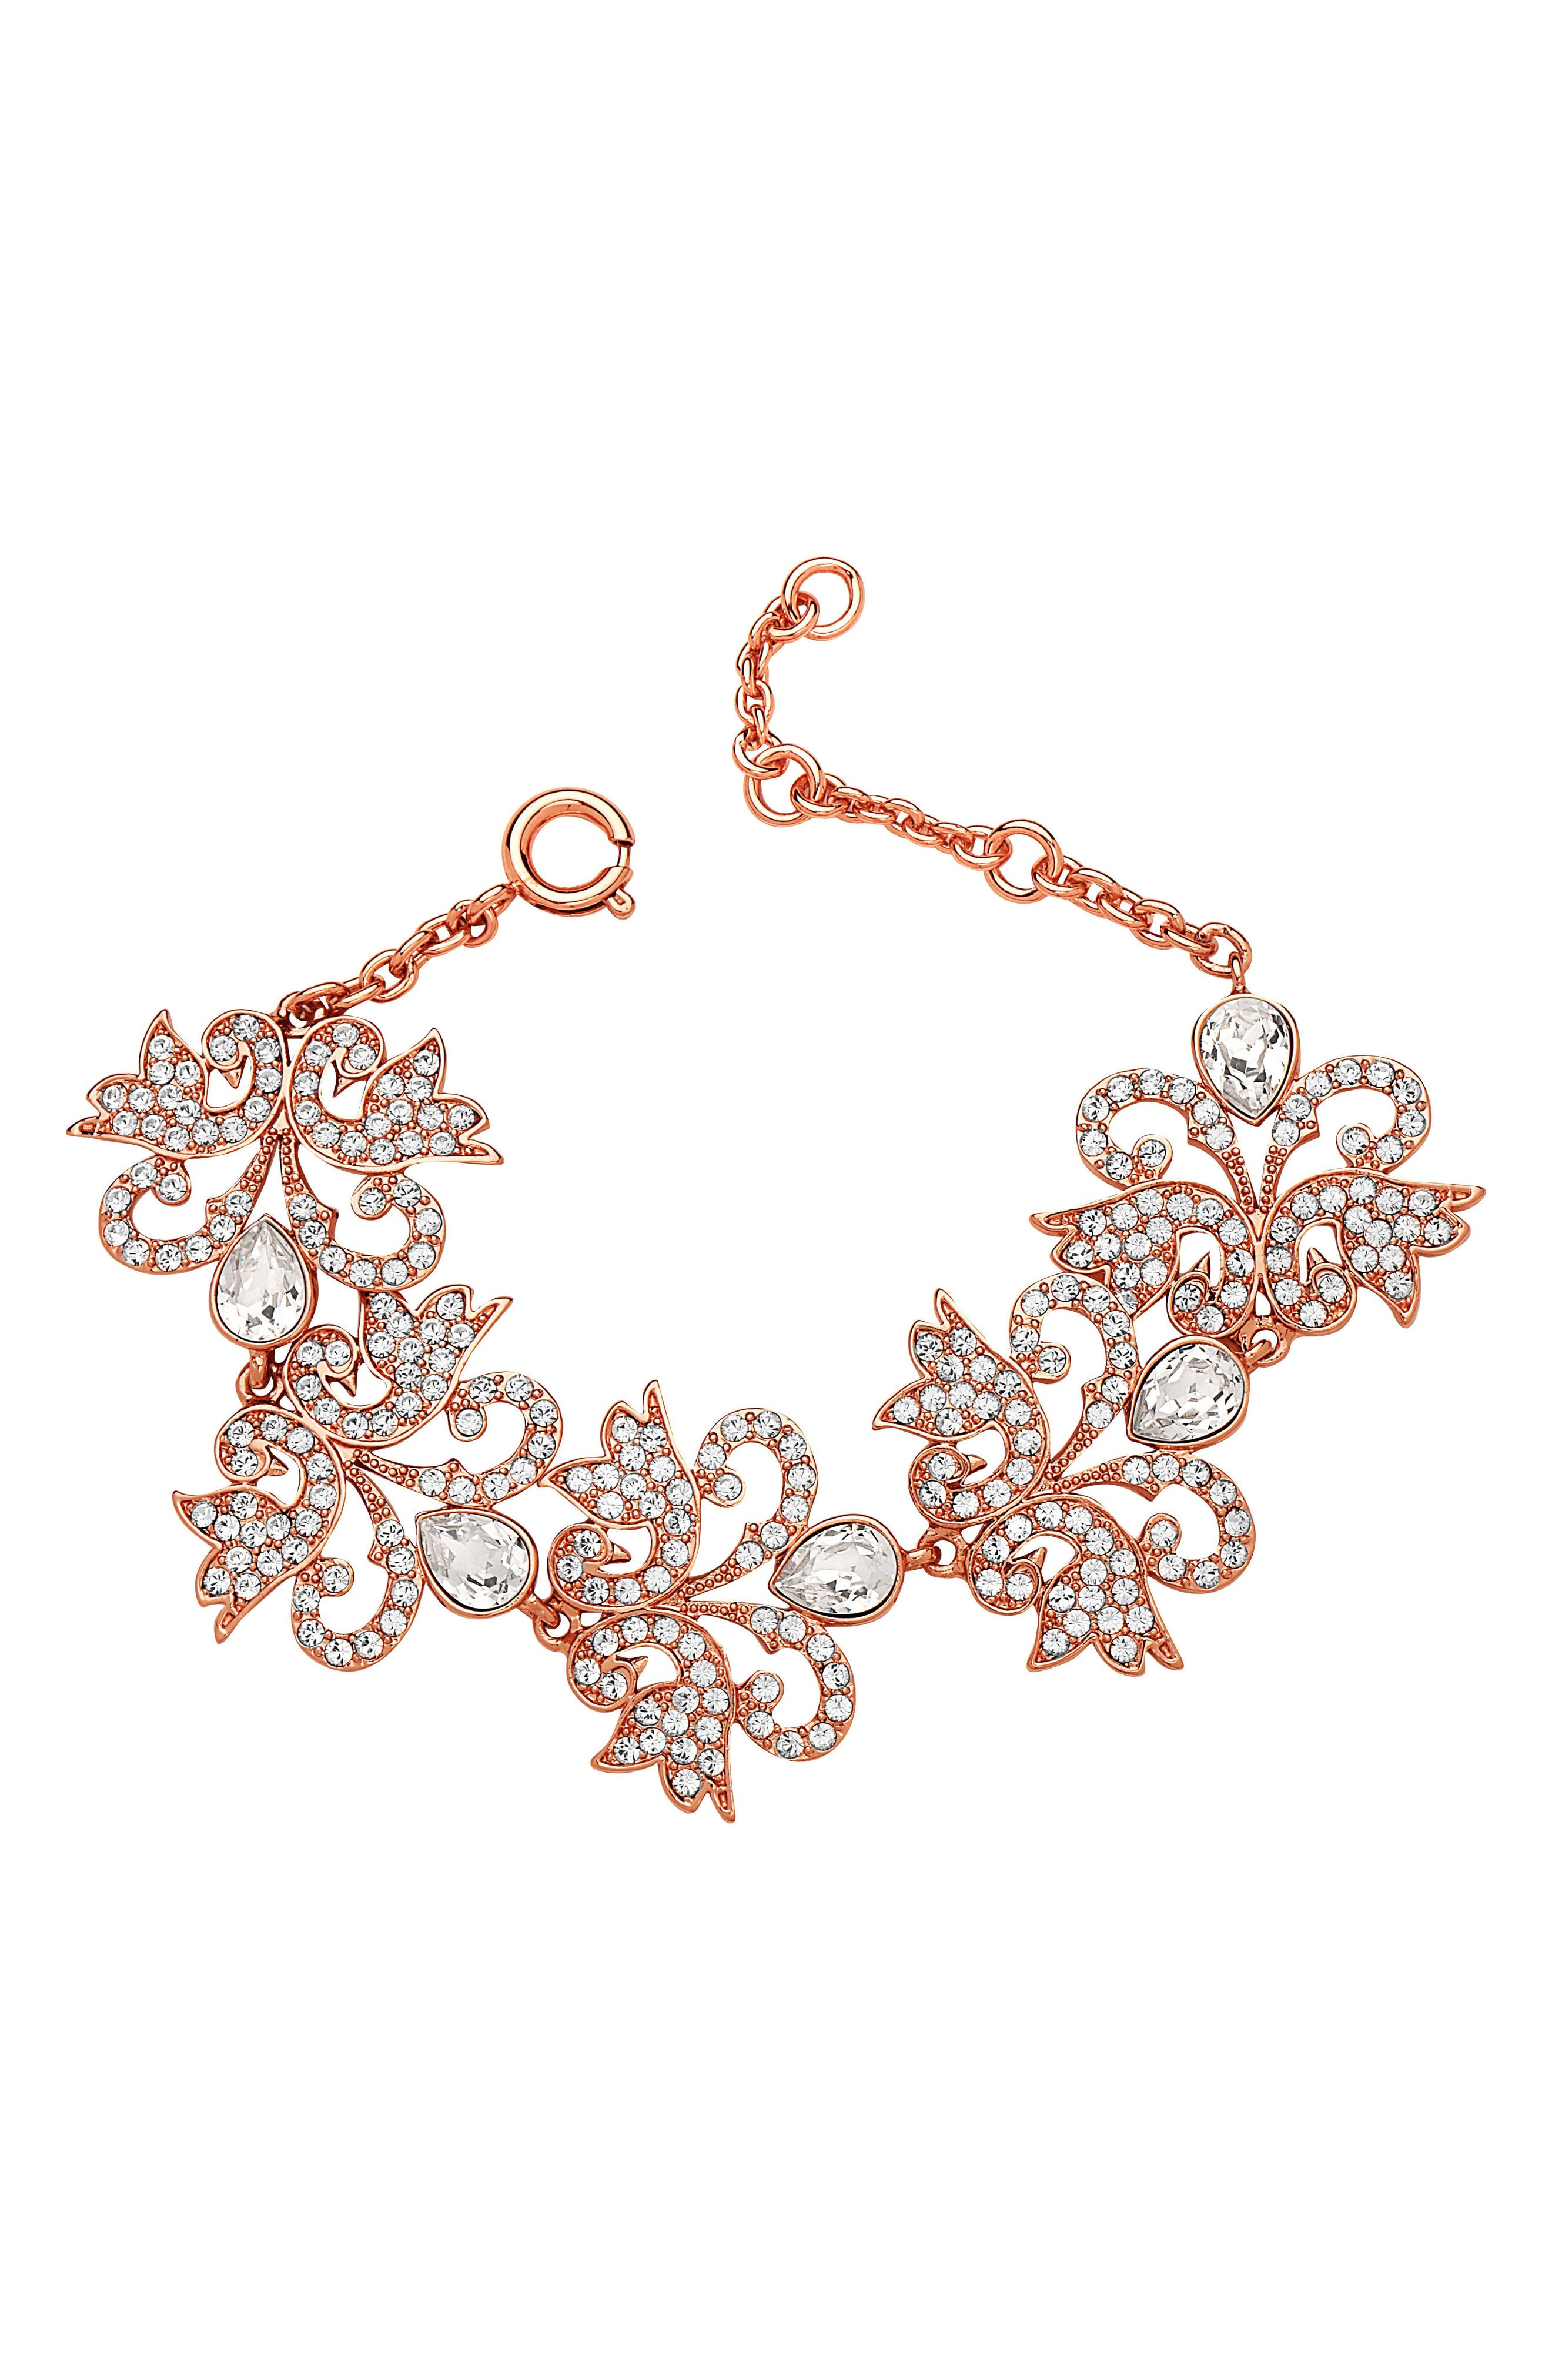 NINA Art Nouveau Chandelier Bracelet